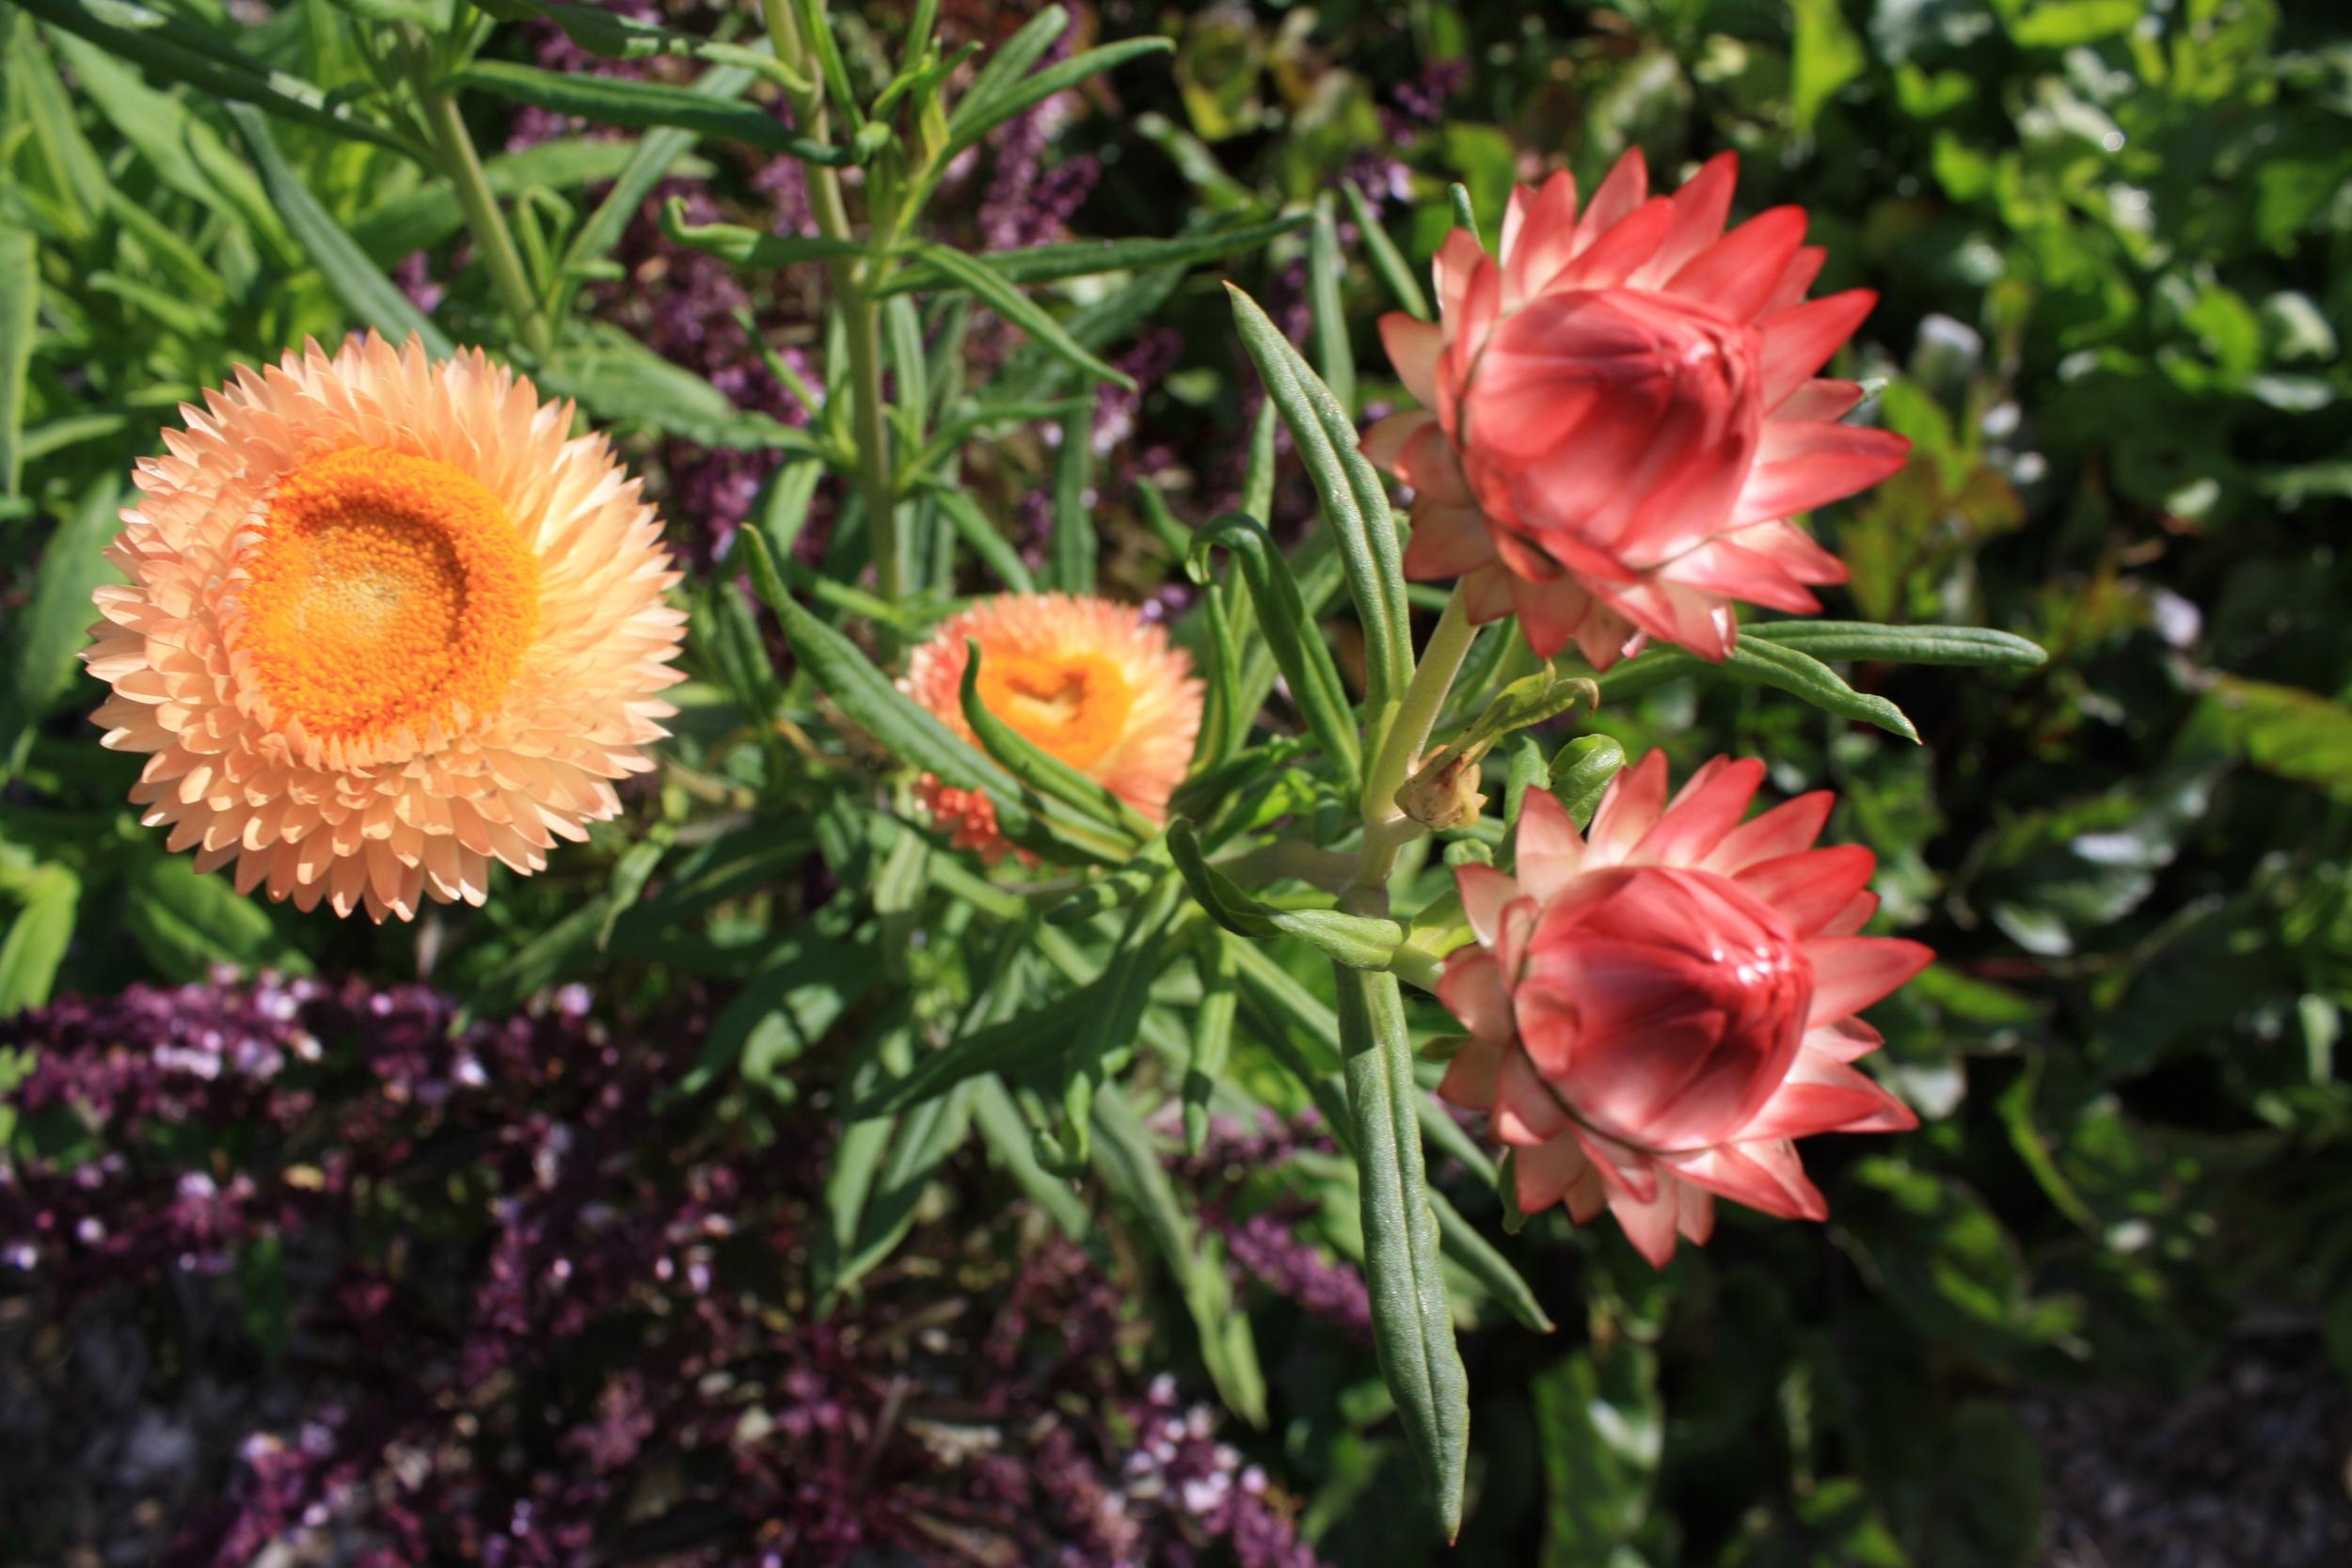 apricotstrawflower.jpg